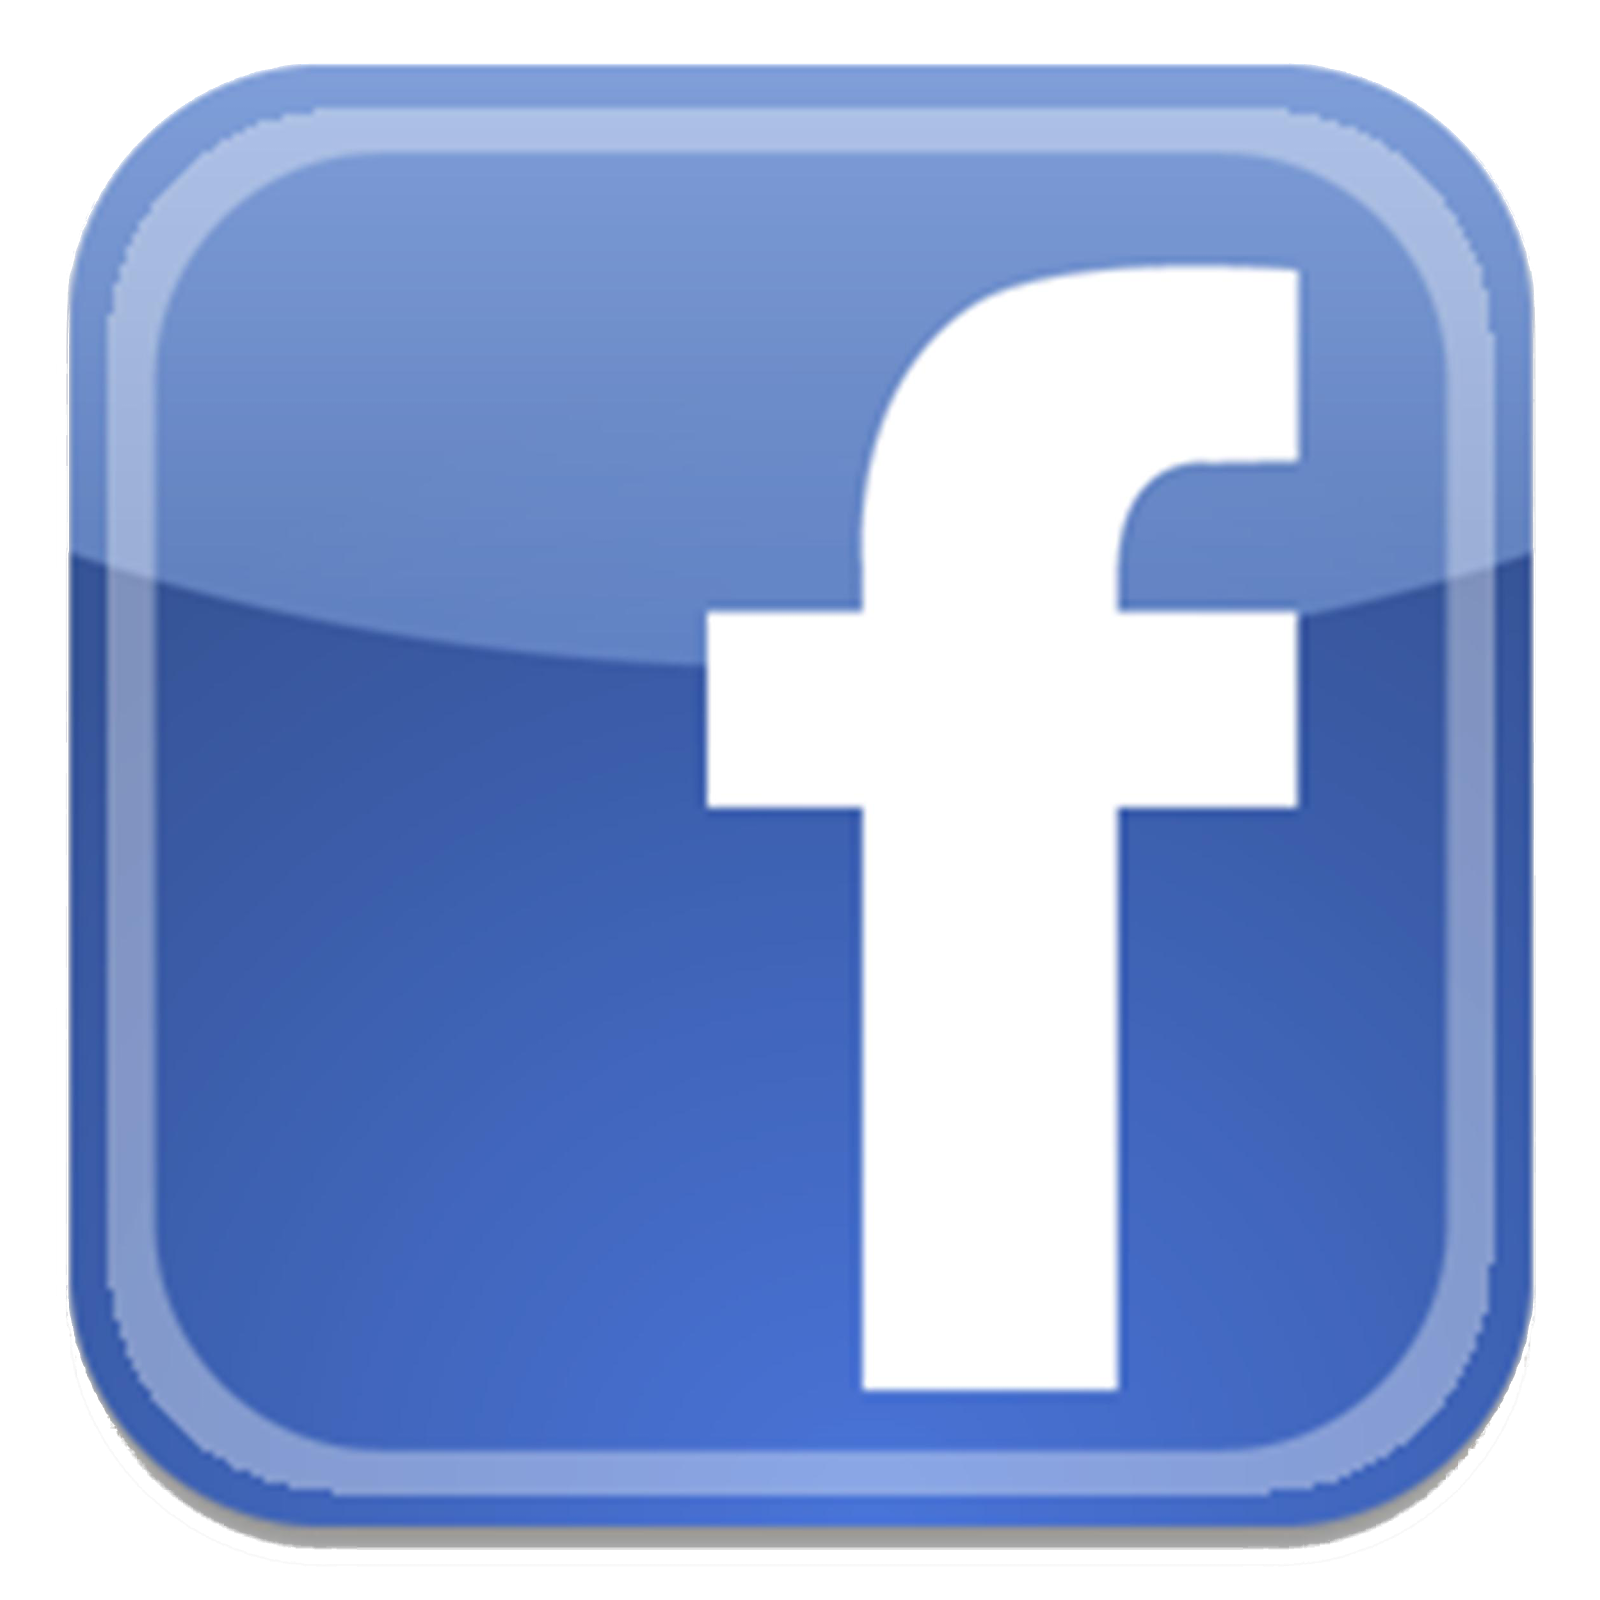 logo facebook color